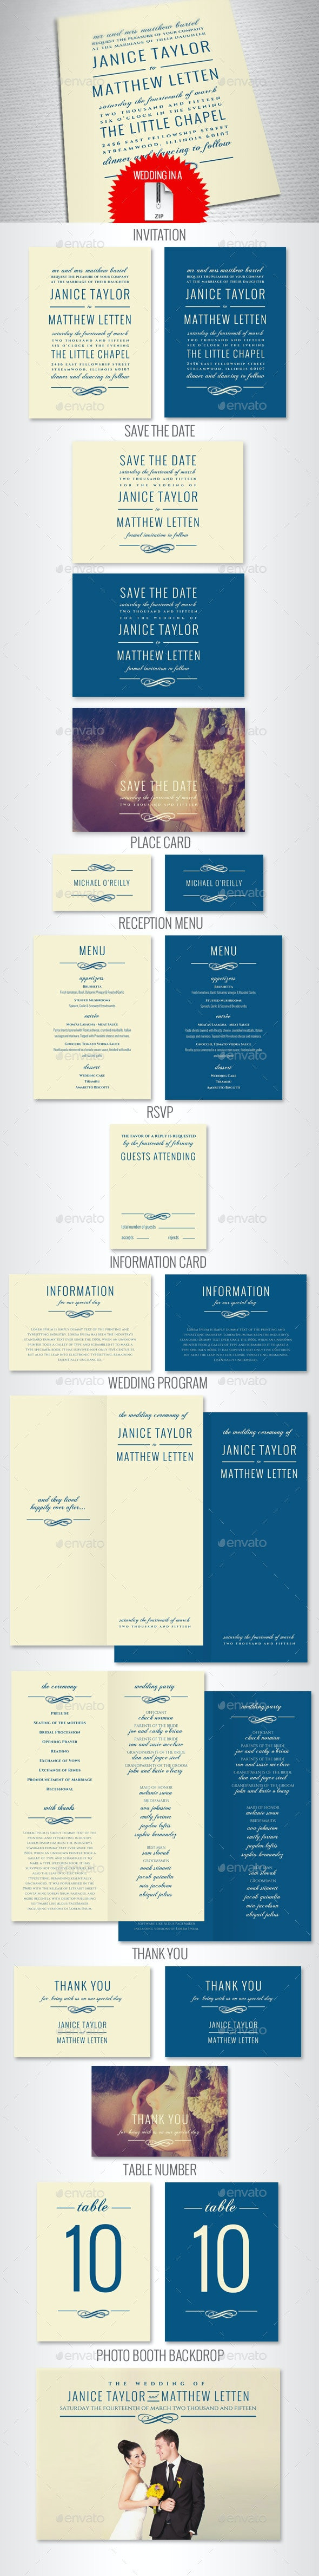 Elegant Wedding Invitation Set - Weddings Cards & Invites